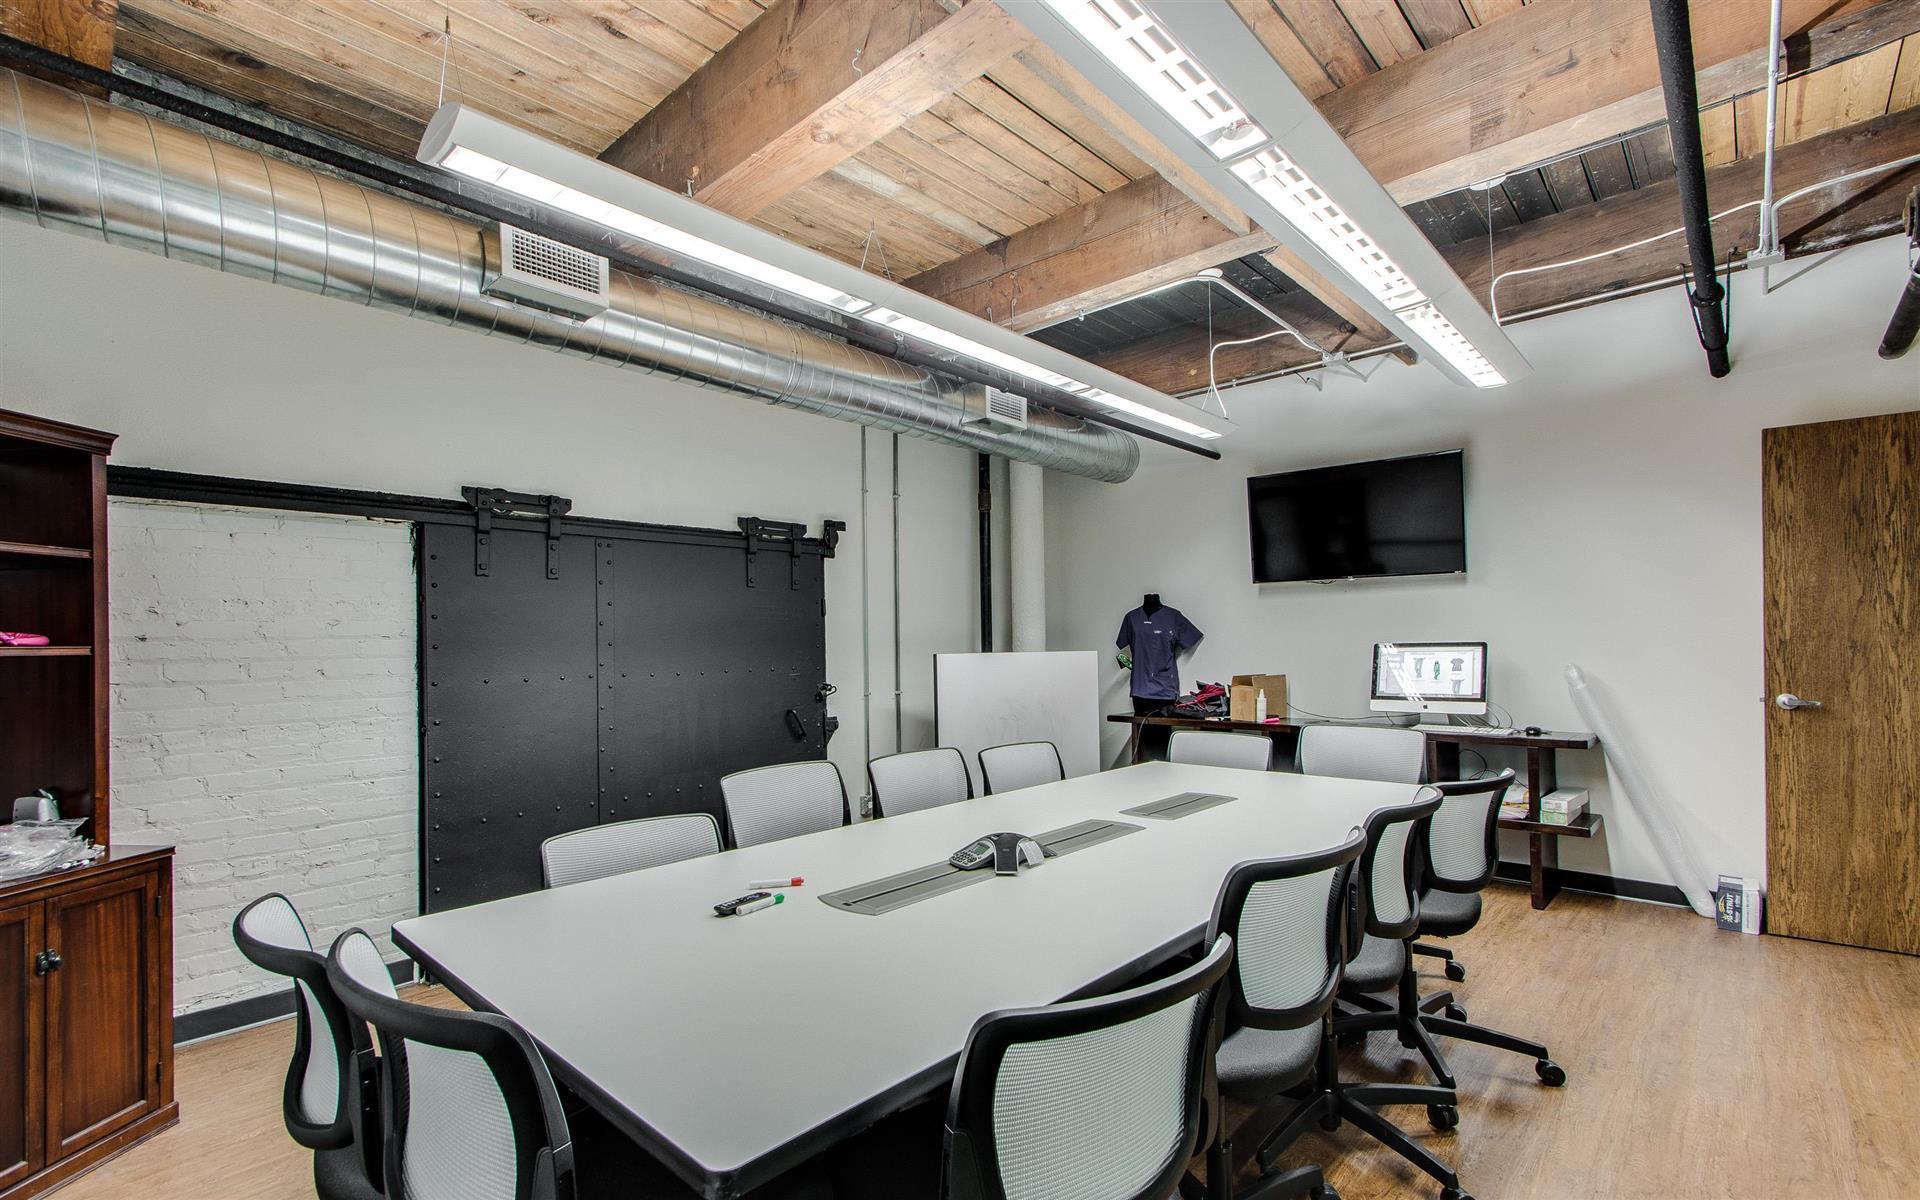 Iguana Team Space - Iguana Conference Room